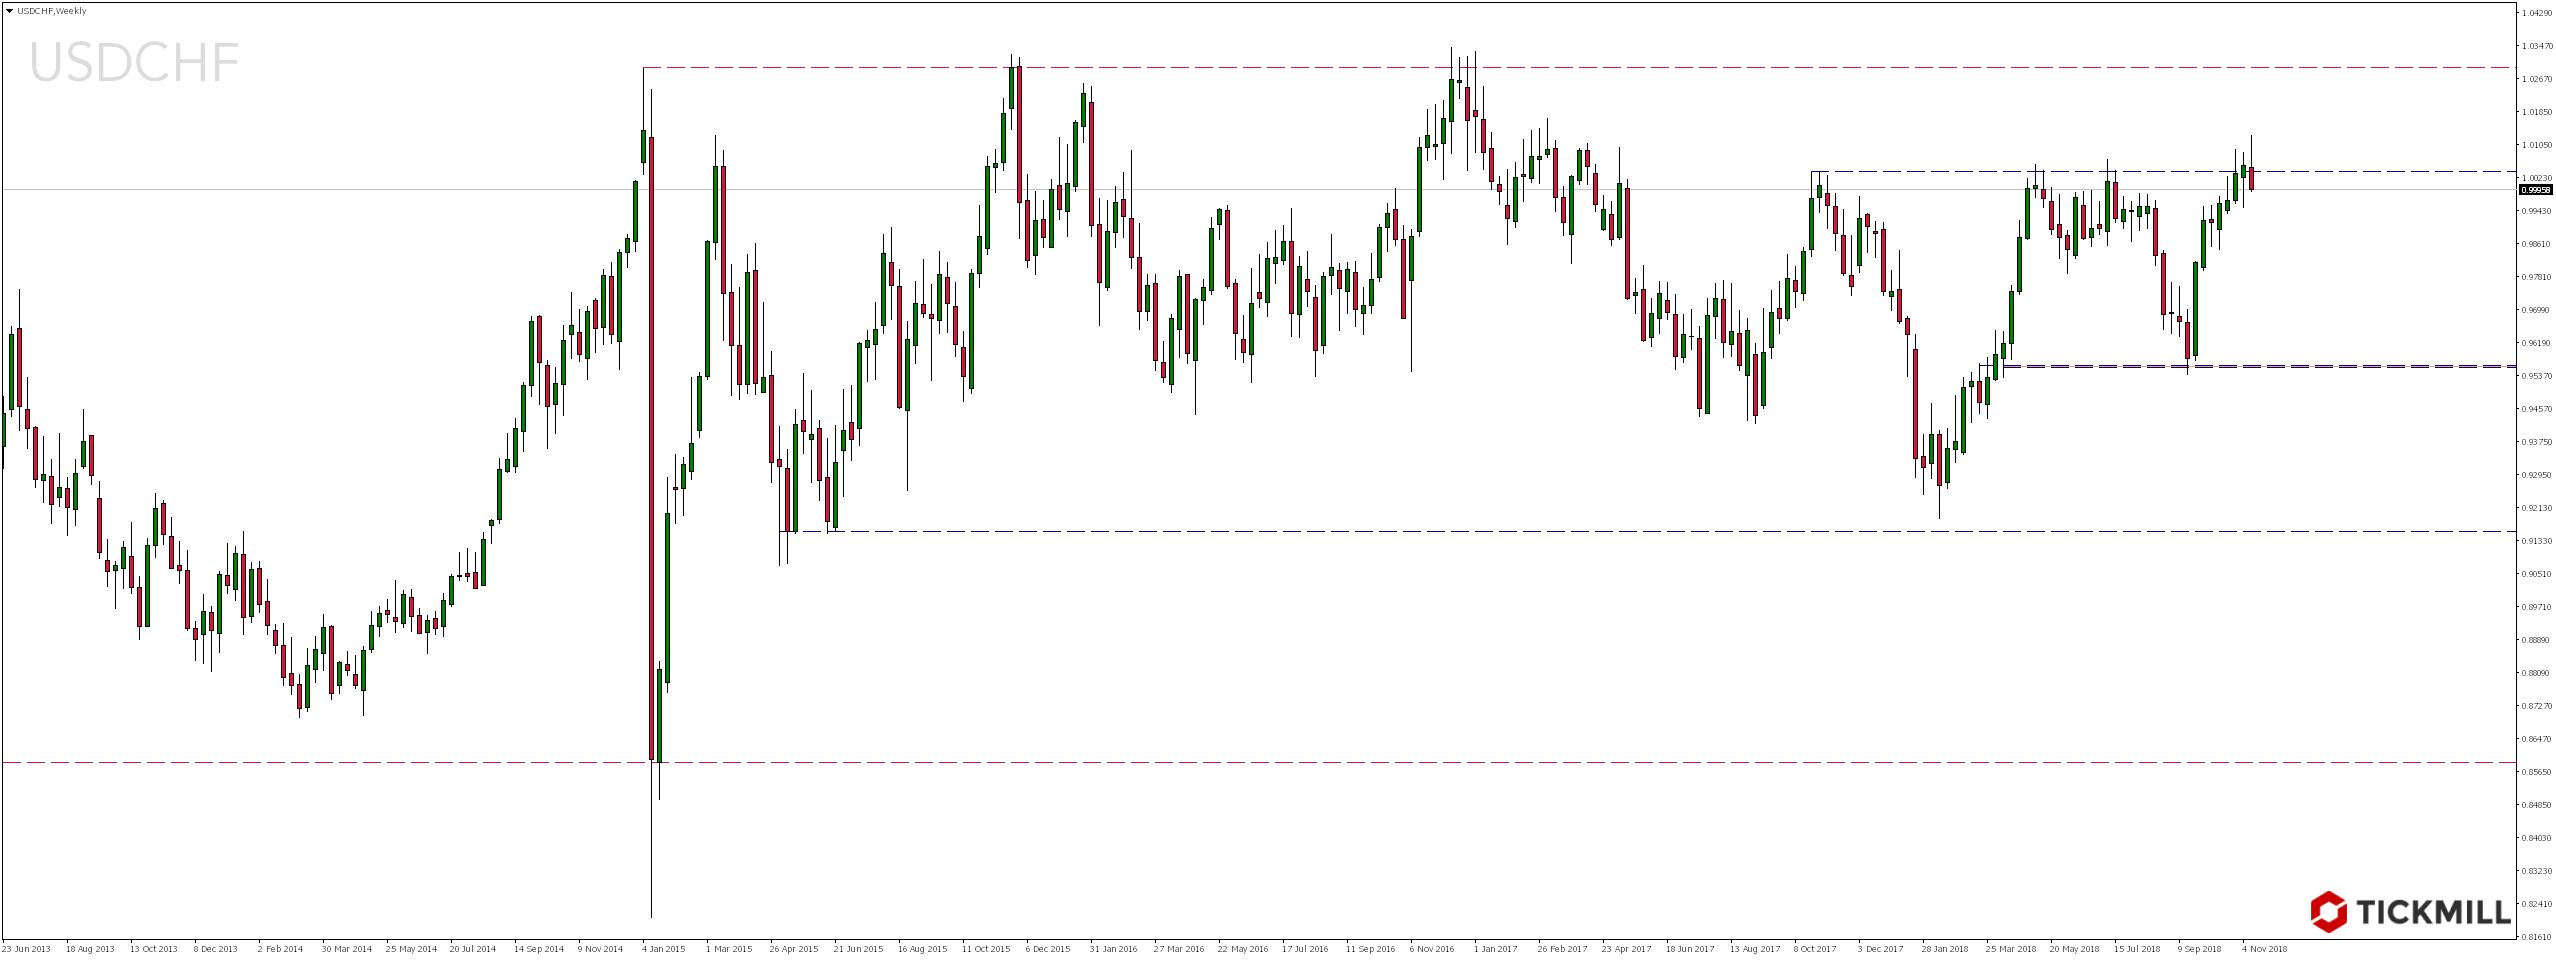 Notowania pary walutowej USDCHF